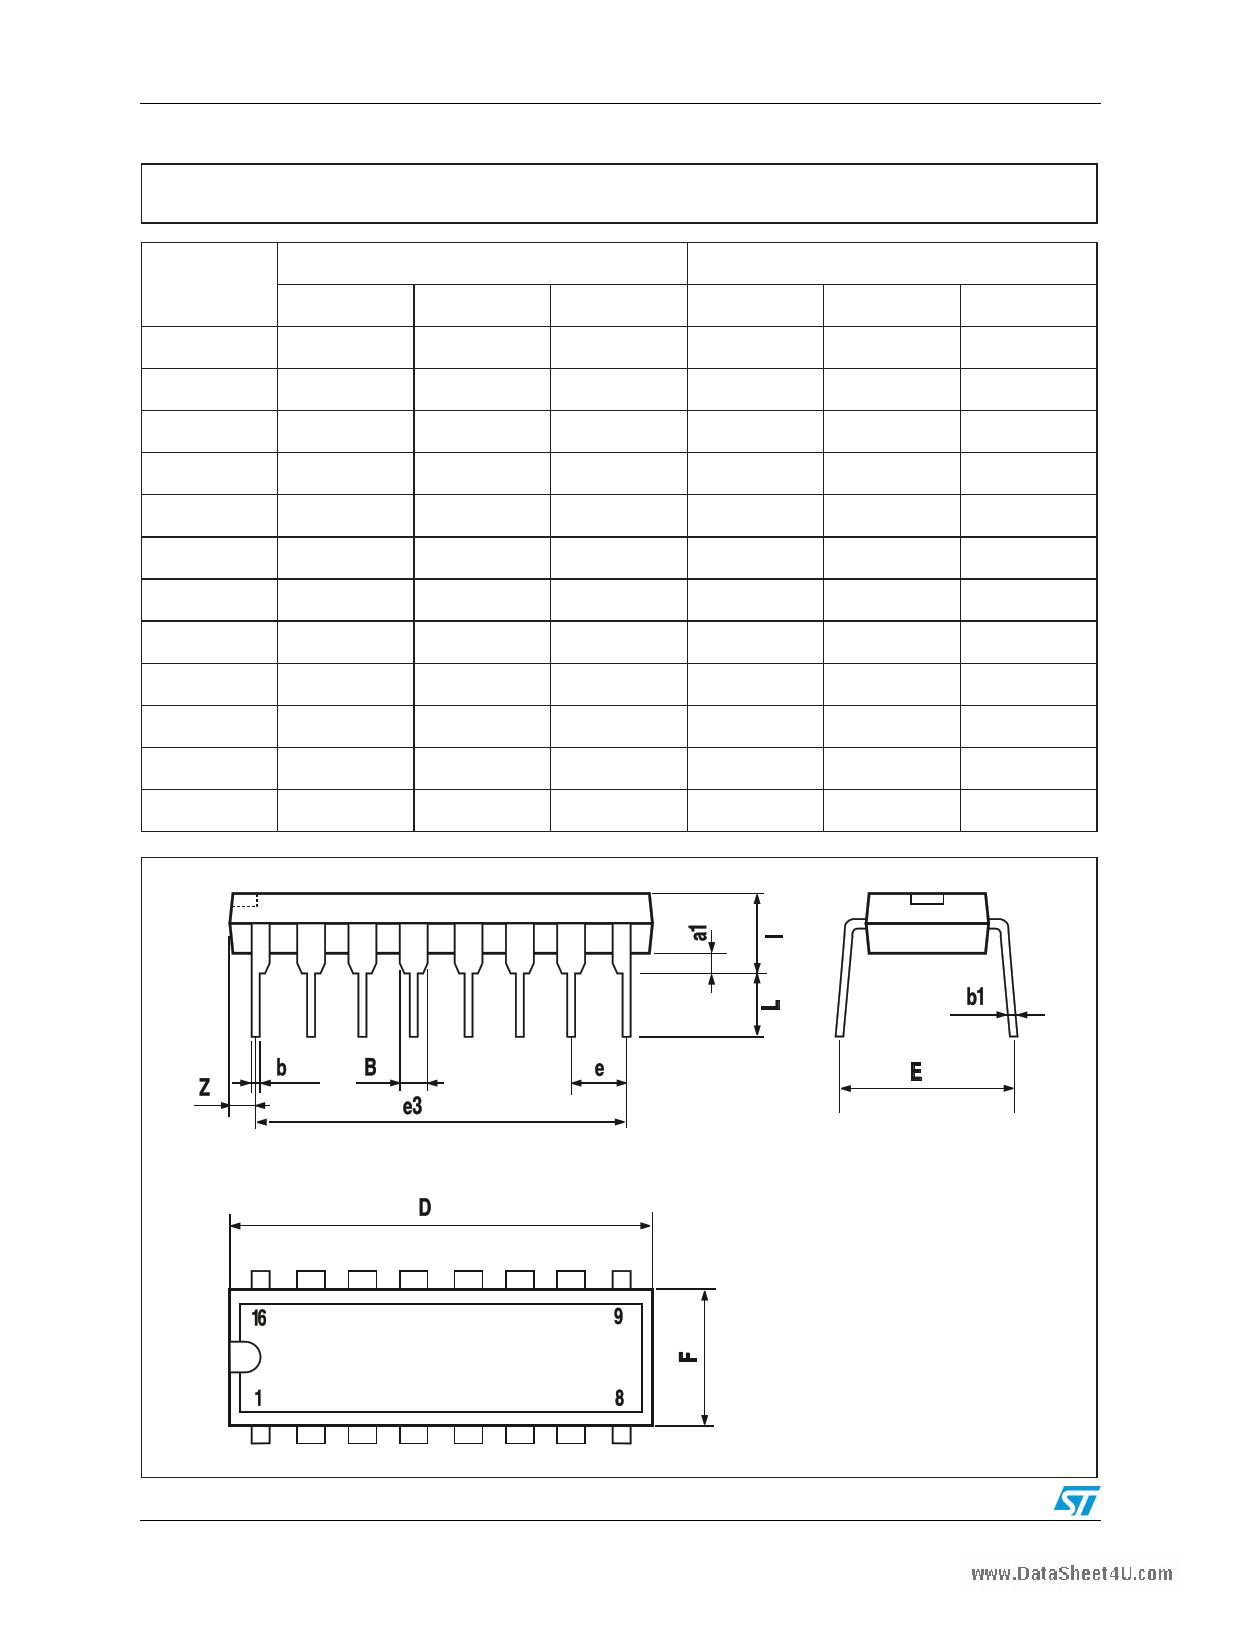 E-ULN200xD1 arduino